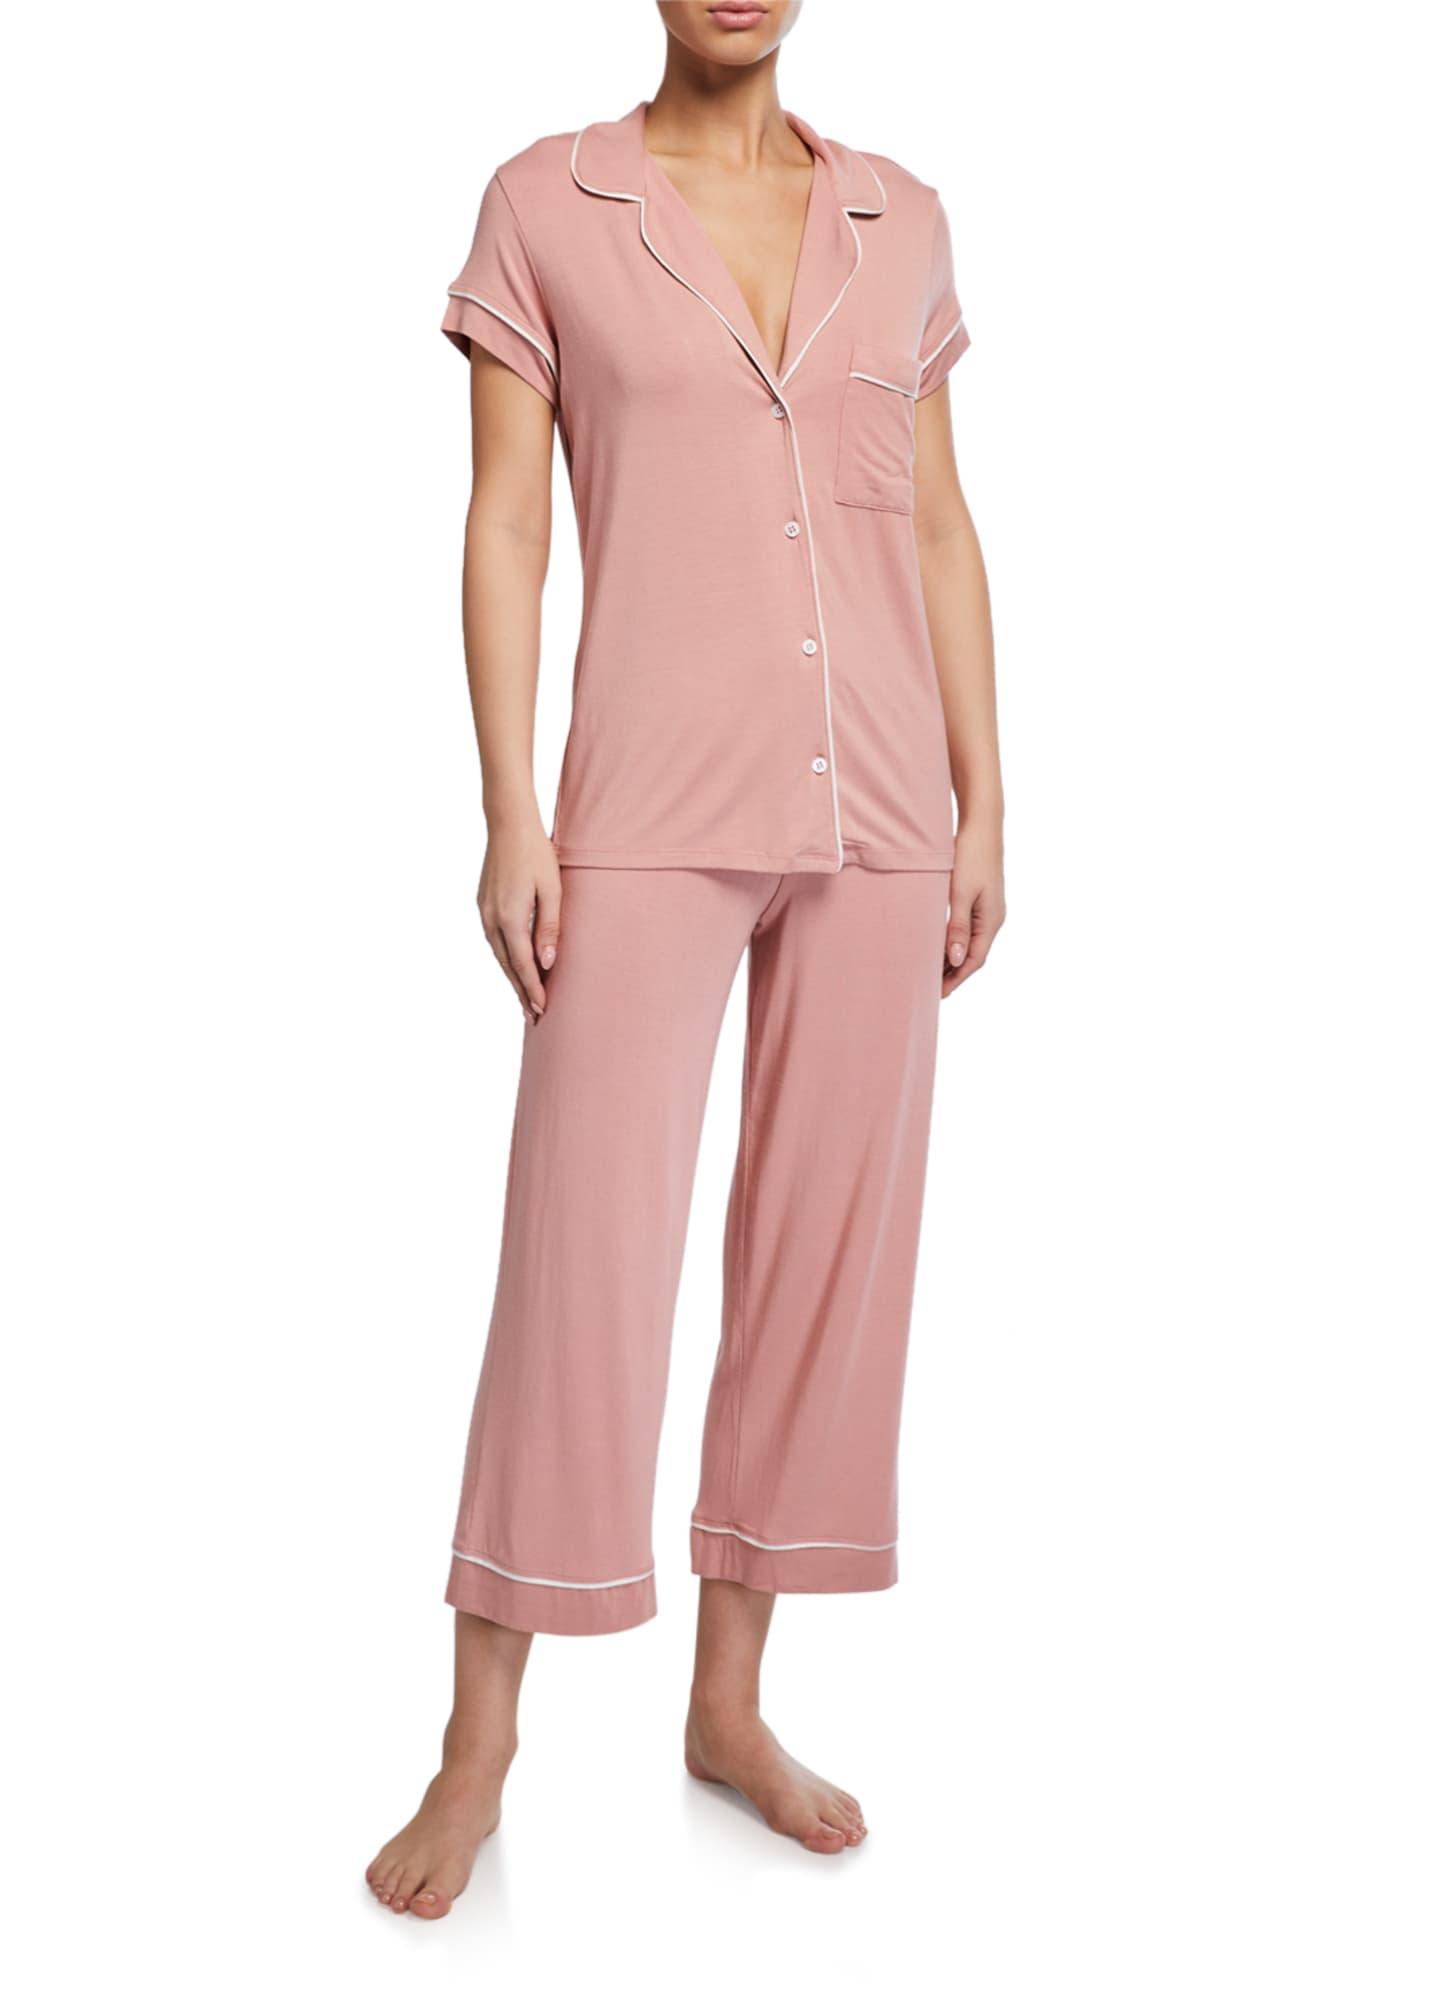 Eberjey Gisele Cropped Two-Piece Jersey Pajama Set